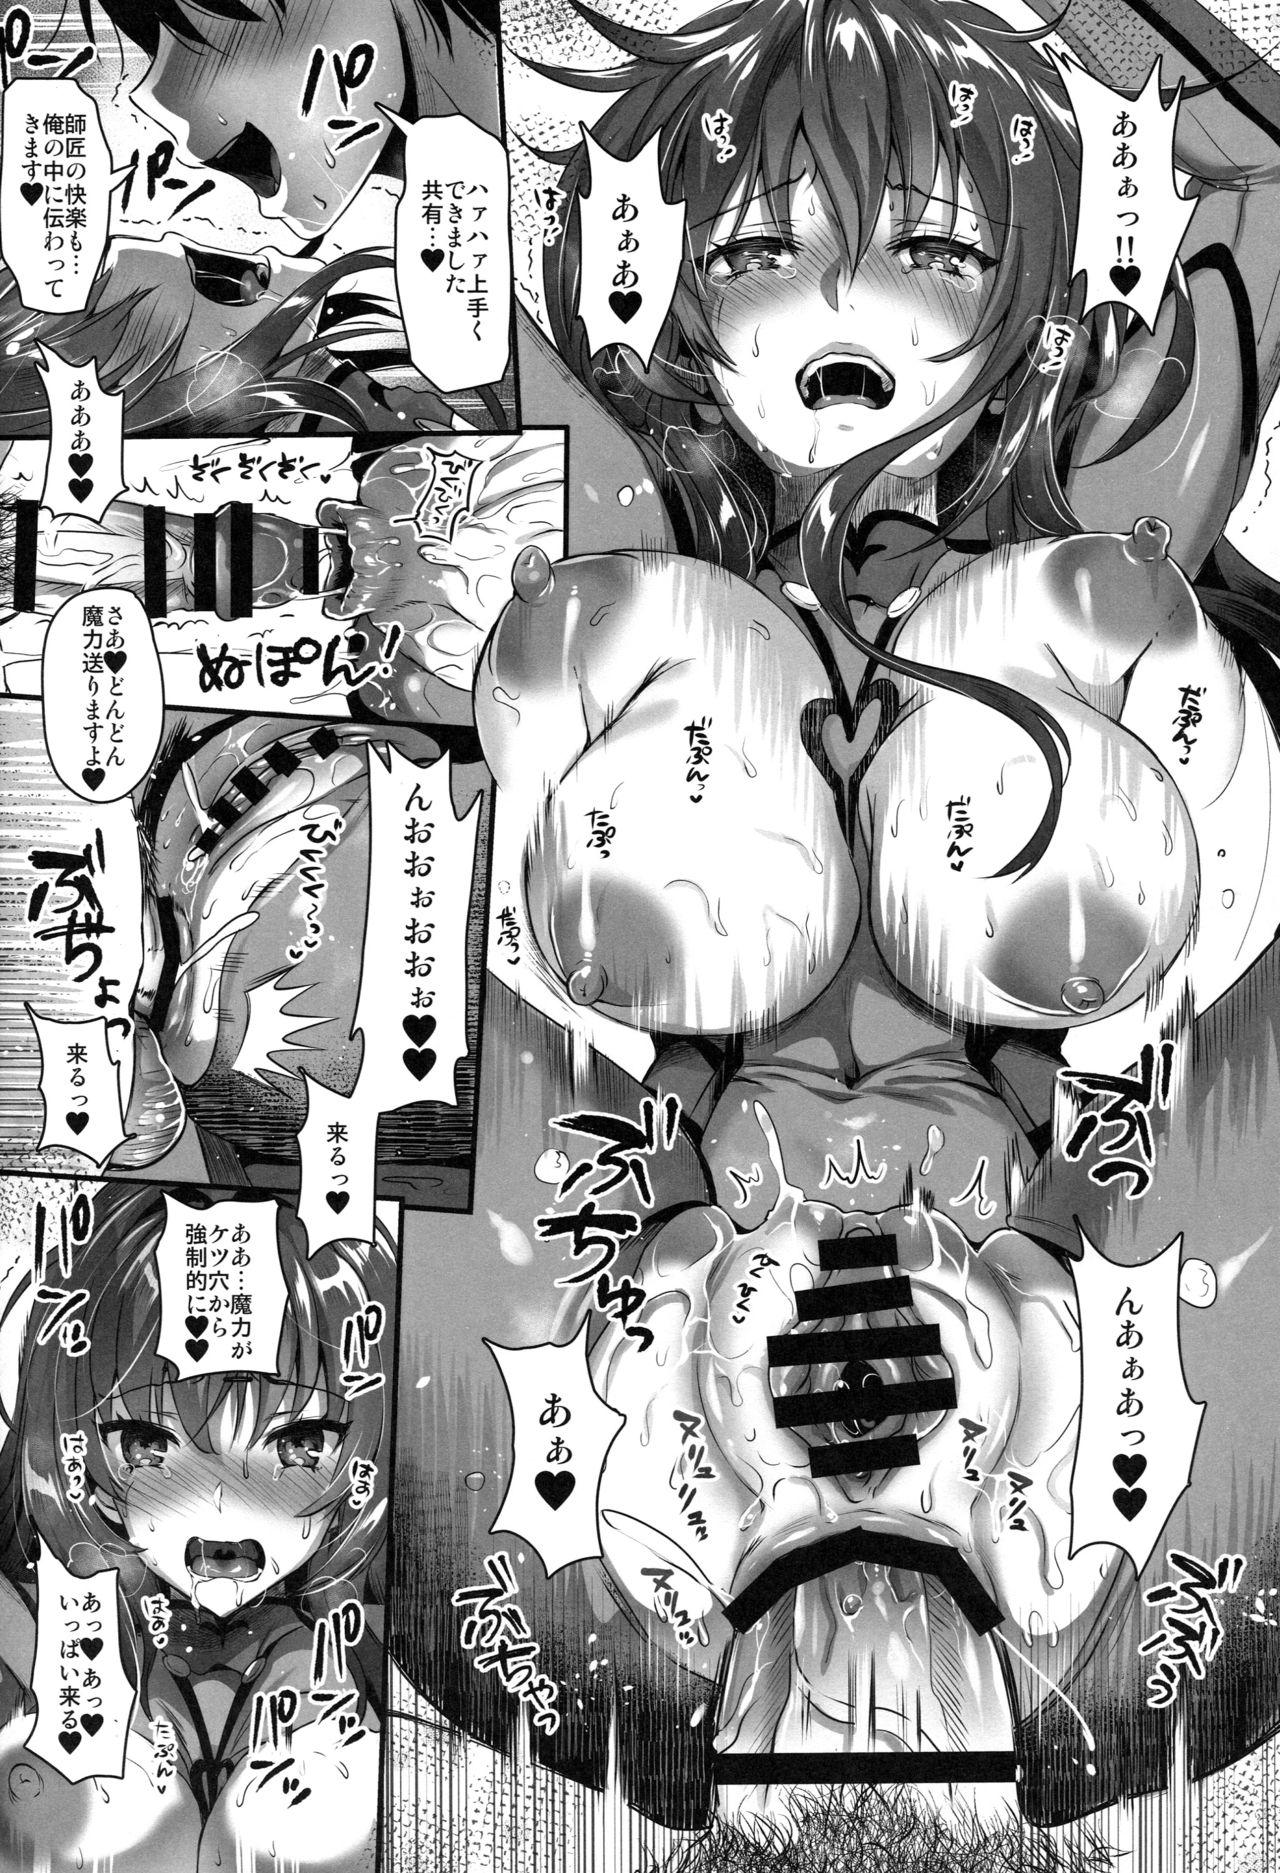 Majutsu Junkou Scathach Anal Seikou - Anal Fuck with Scathach 14